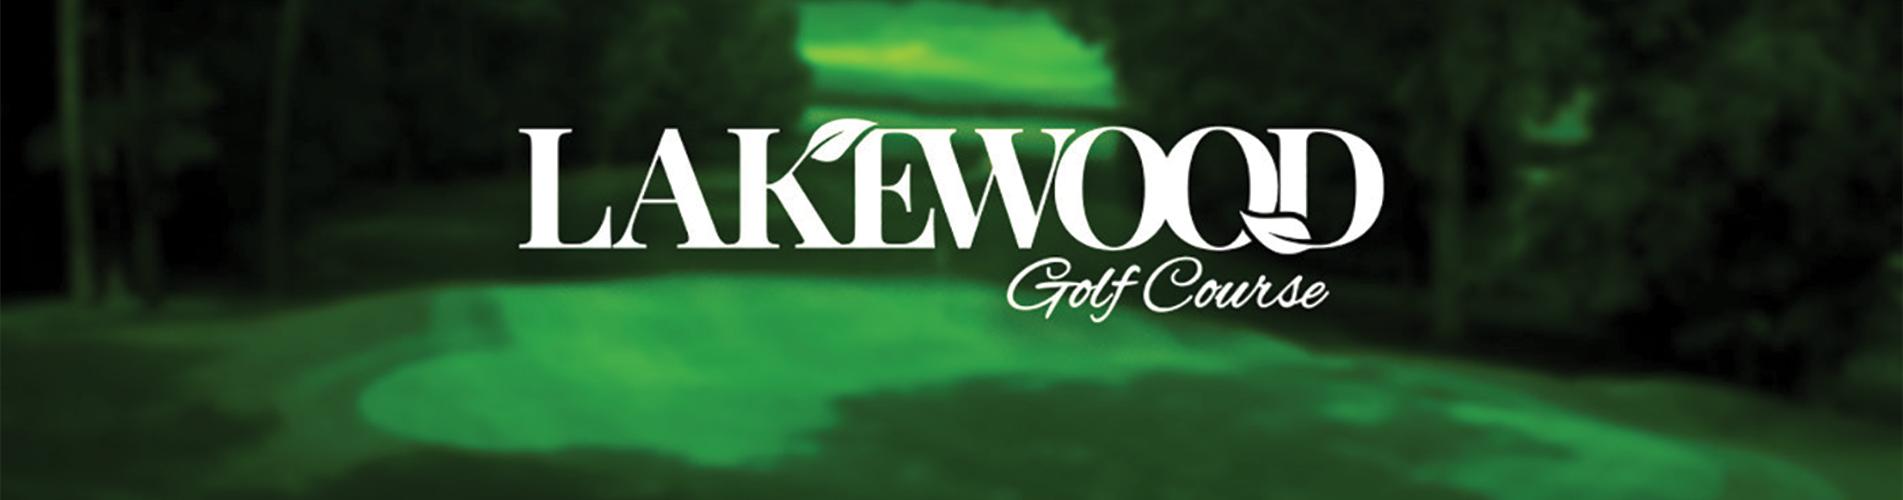 Lions Sponsor East Alabama Chamber Golf Friday